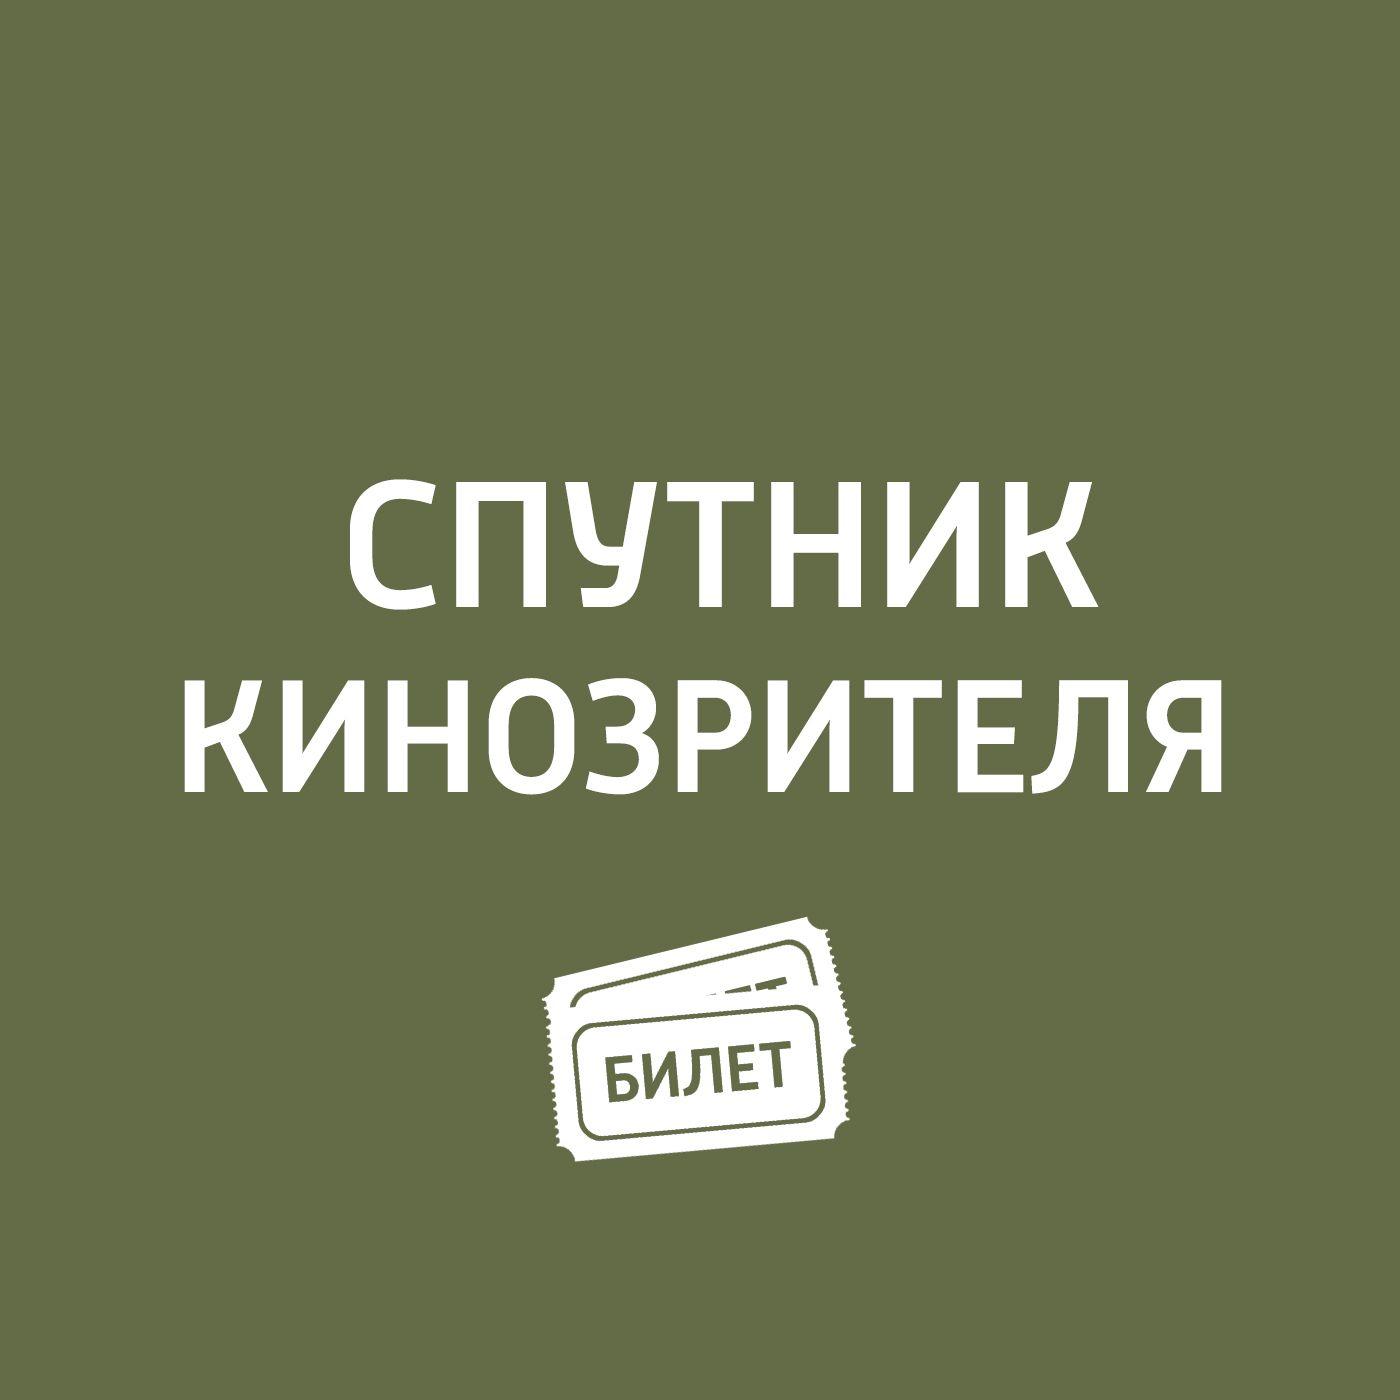 Антон Долин О фестивале Артдокфест-2018 антон долин премьеры с 22 декабря